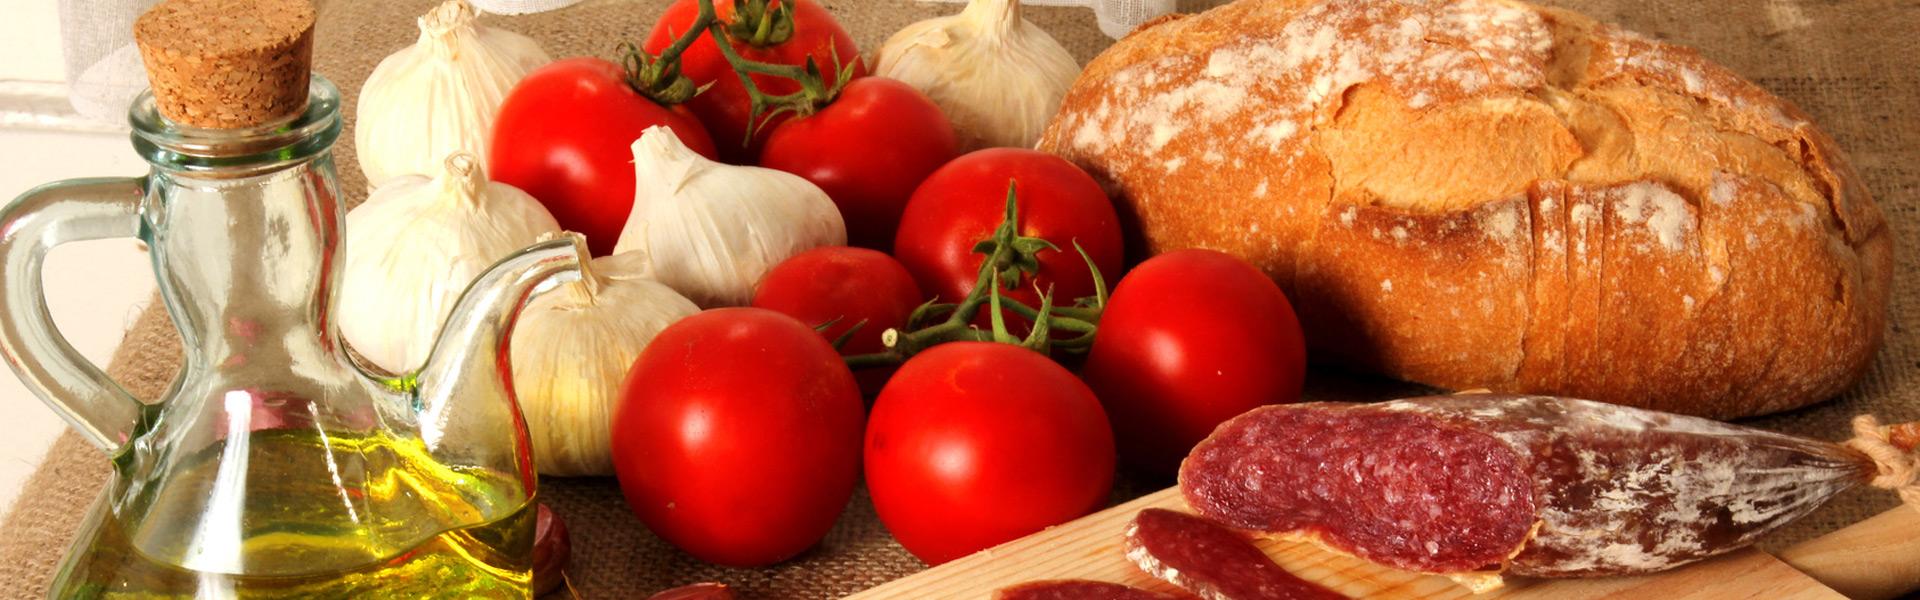 Eurotirviajes | Gastronomía